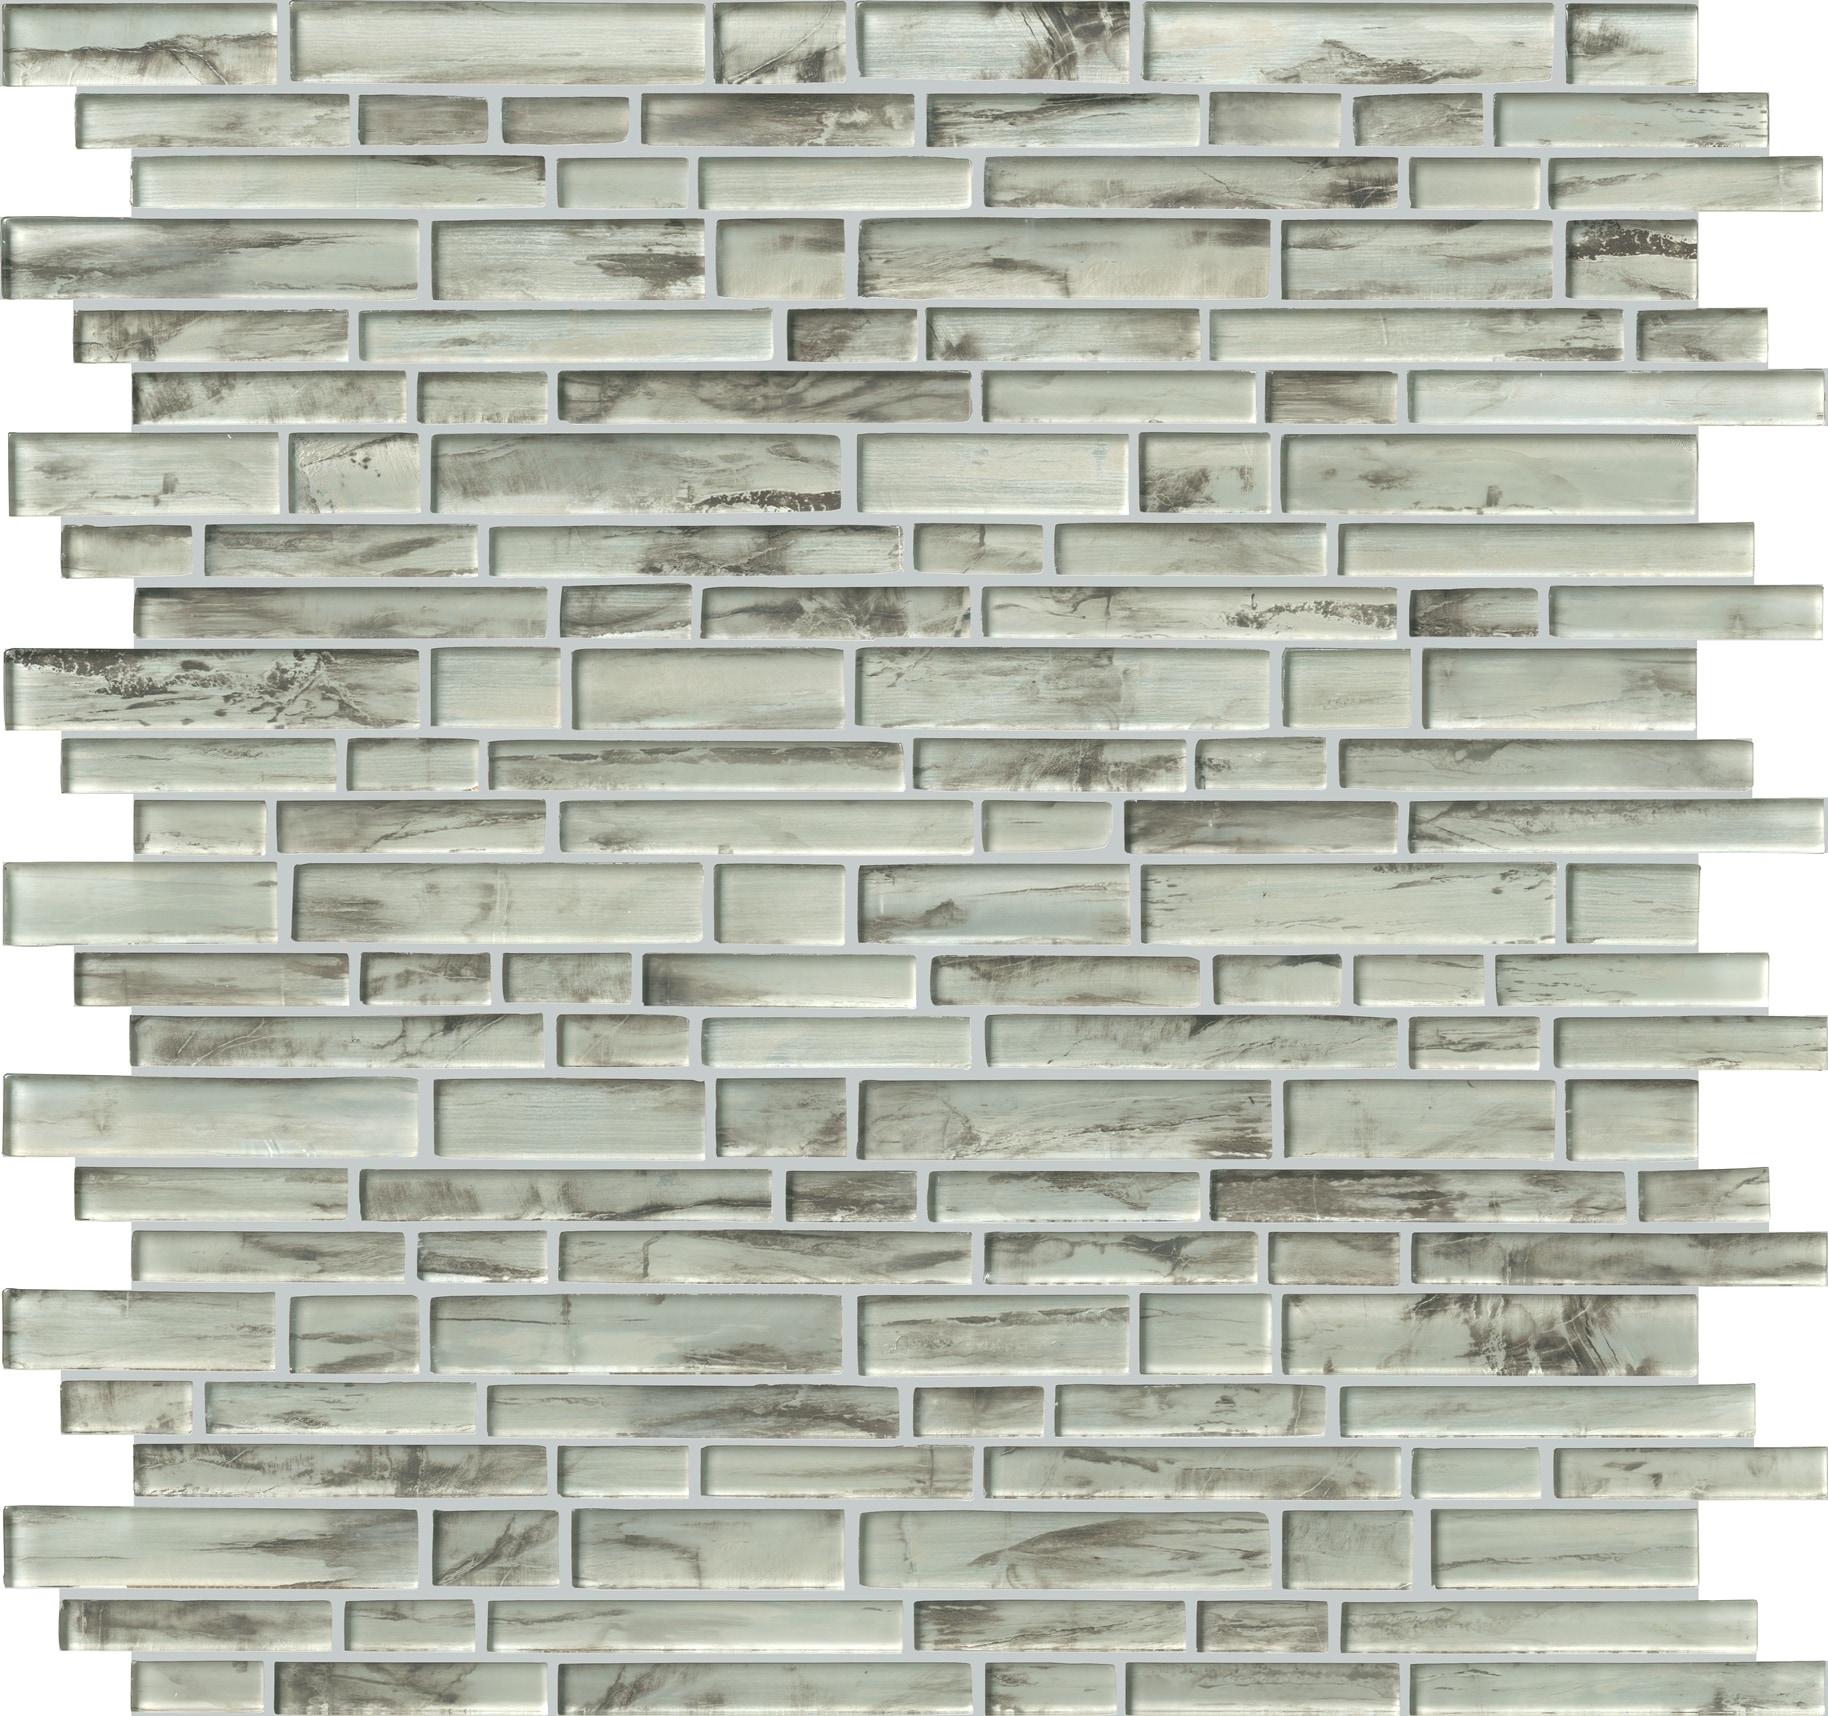 Silvermist Interlocking 8mm / Pattern / Mixed Glass Mosaic - Silvermist Collection 0